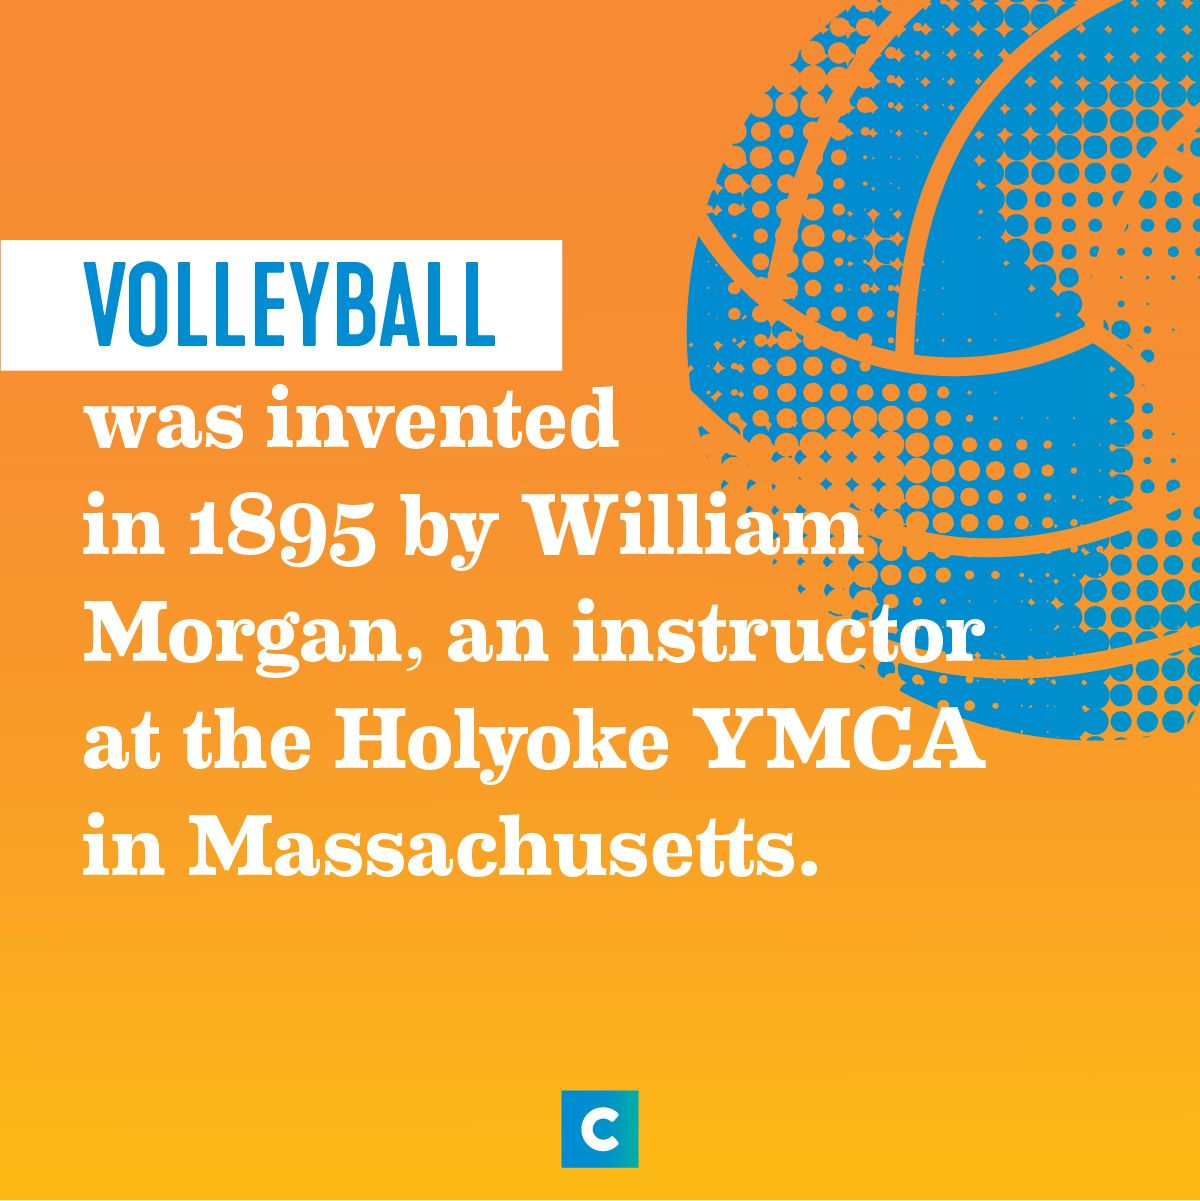 Ymca Fun Facts Volleyball Ymca Fun Facts Wellness Studio